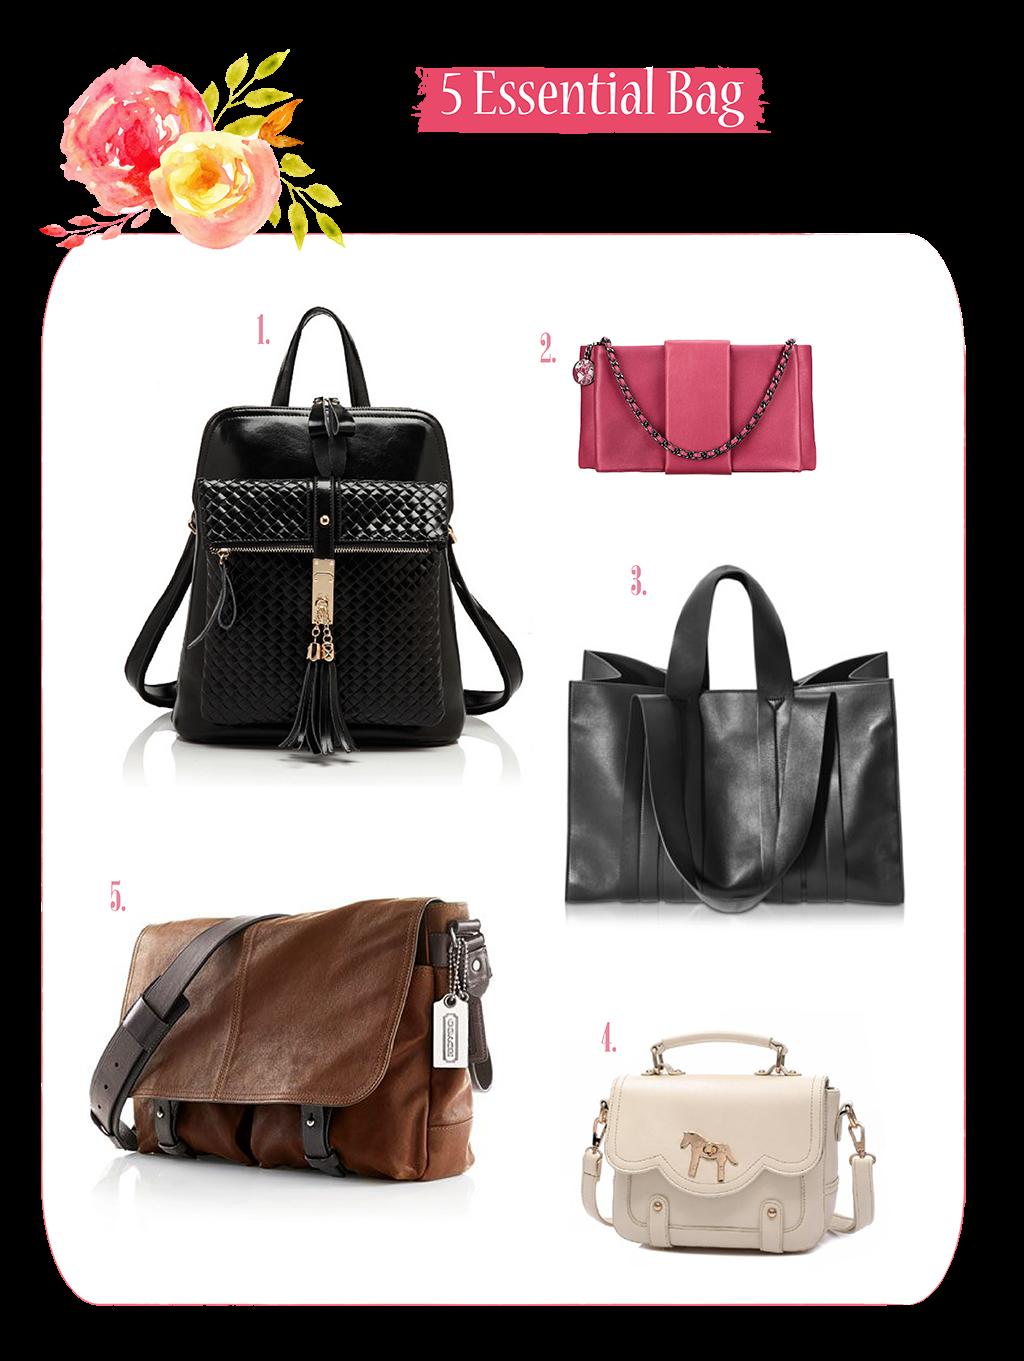 5 Essential Bag For Every Women